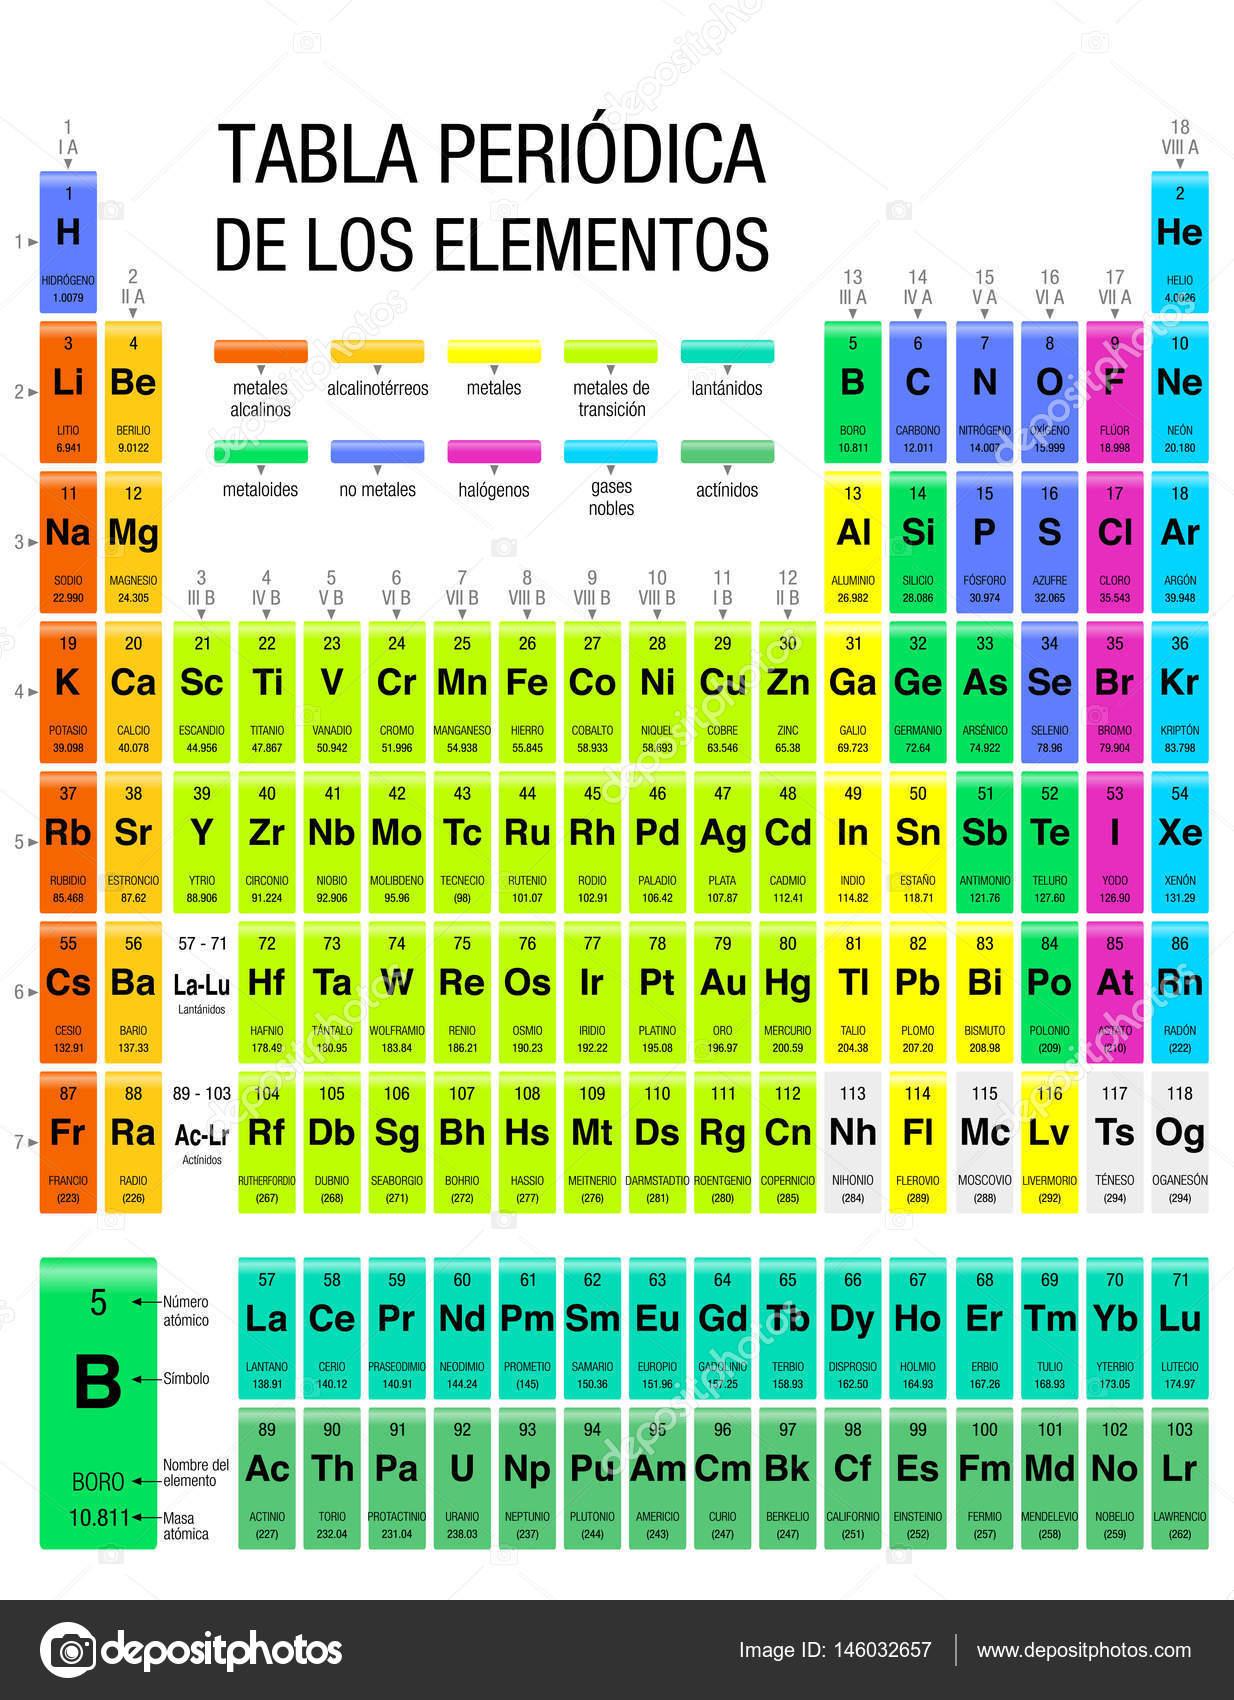 Tabla periodica de los elementos periodick tabulka prvk ve tabla periodica de los elementos periodick tabulka prvk ve panlskm jazyce 4 nov prvky kter jsou obsaeny na 28 listopadu 2016 podle iupac urtaz Images